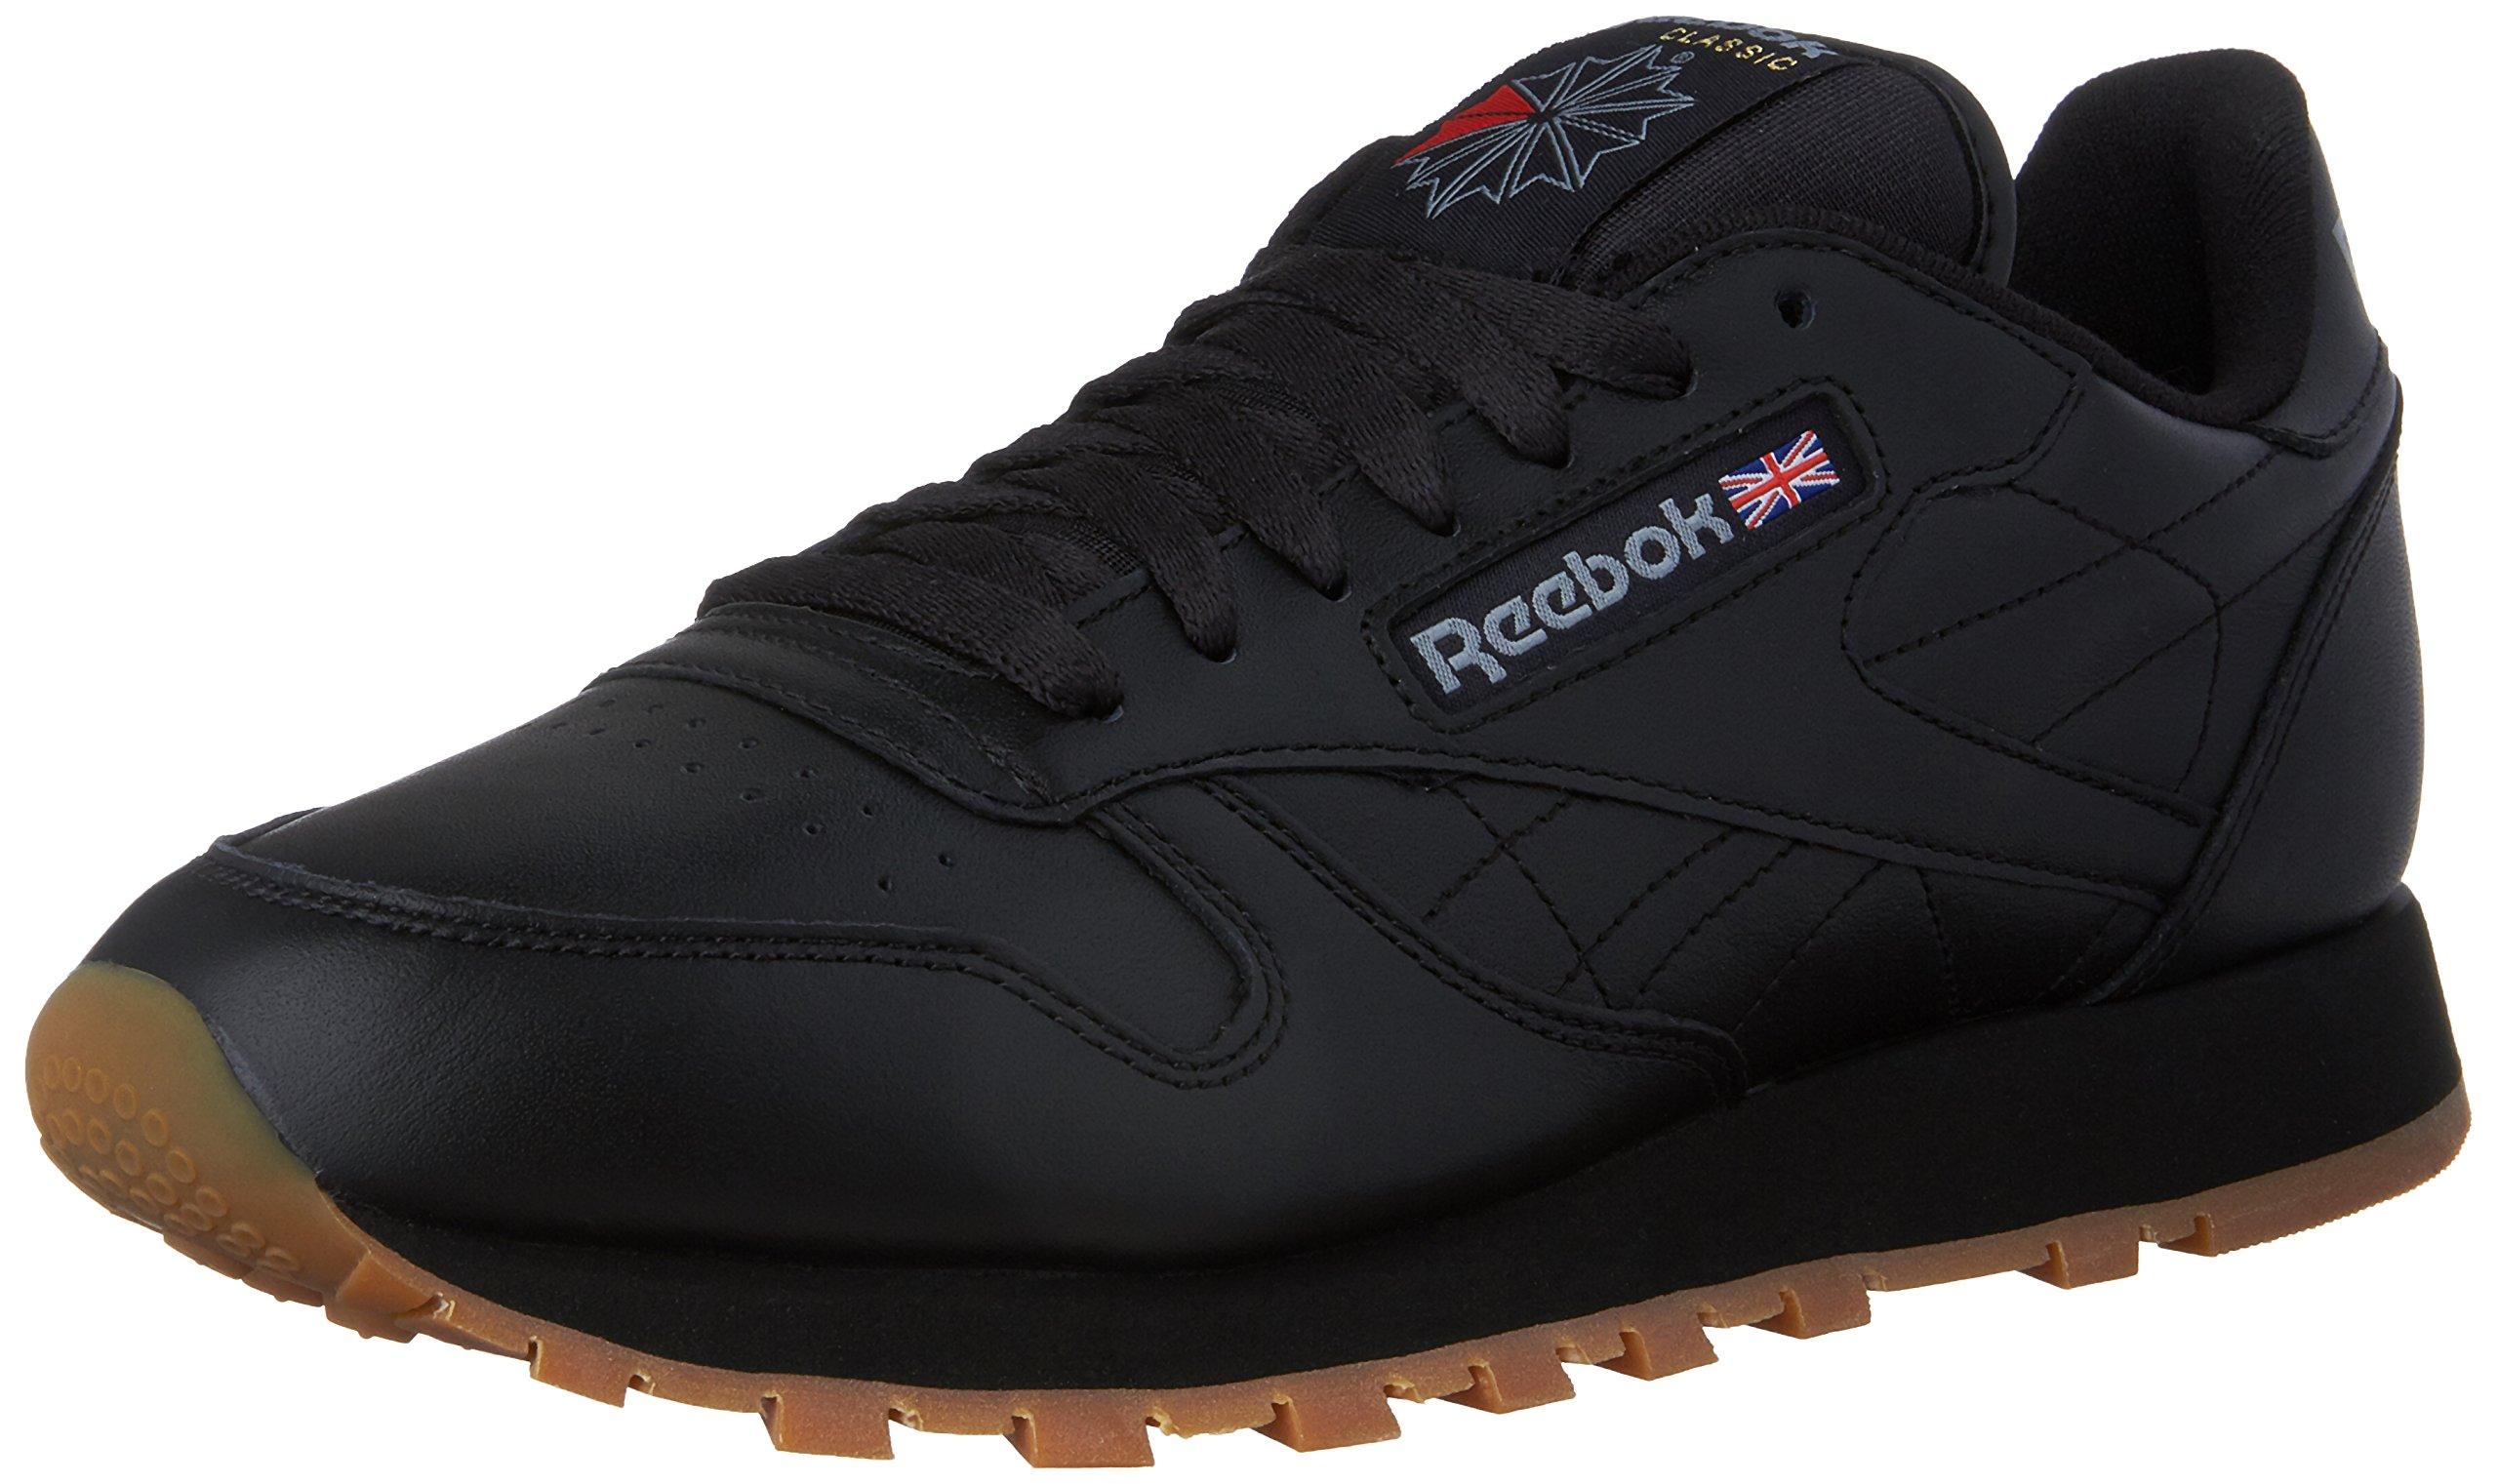 Reebok Men's Classic Leather Sneaker, Black/Gum, 11.5 M US